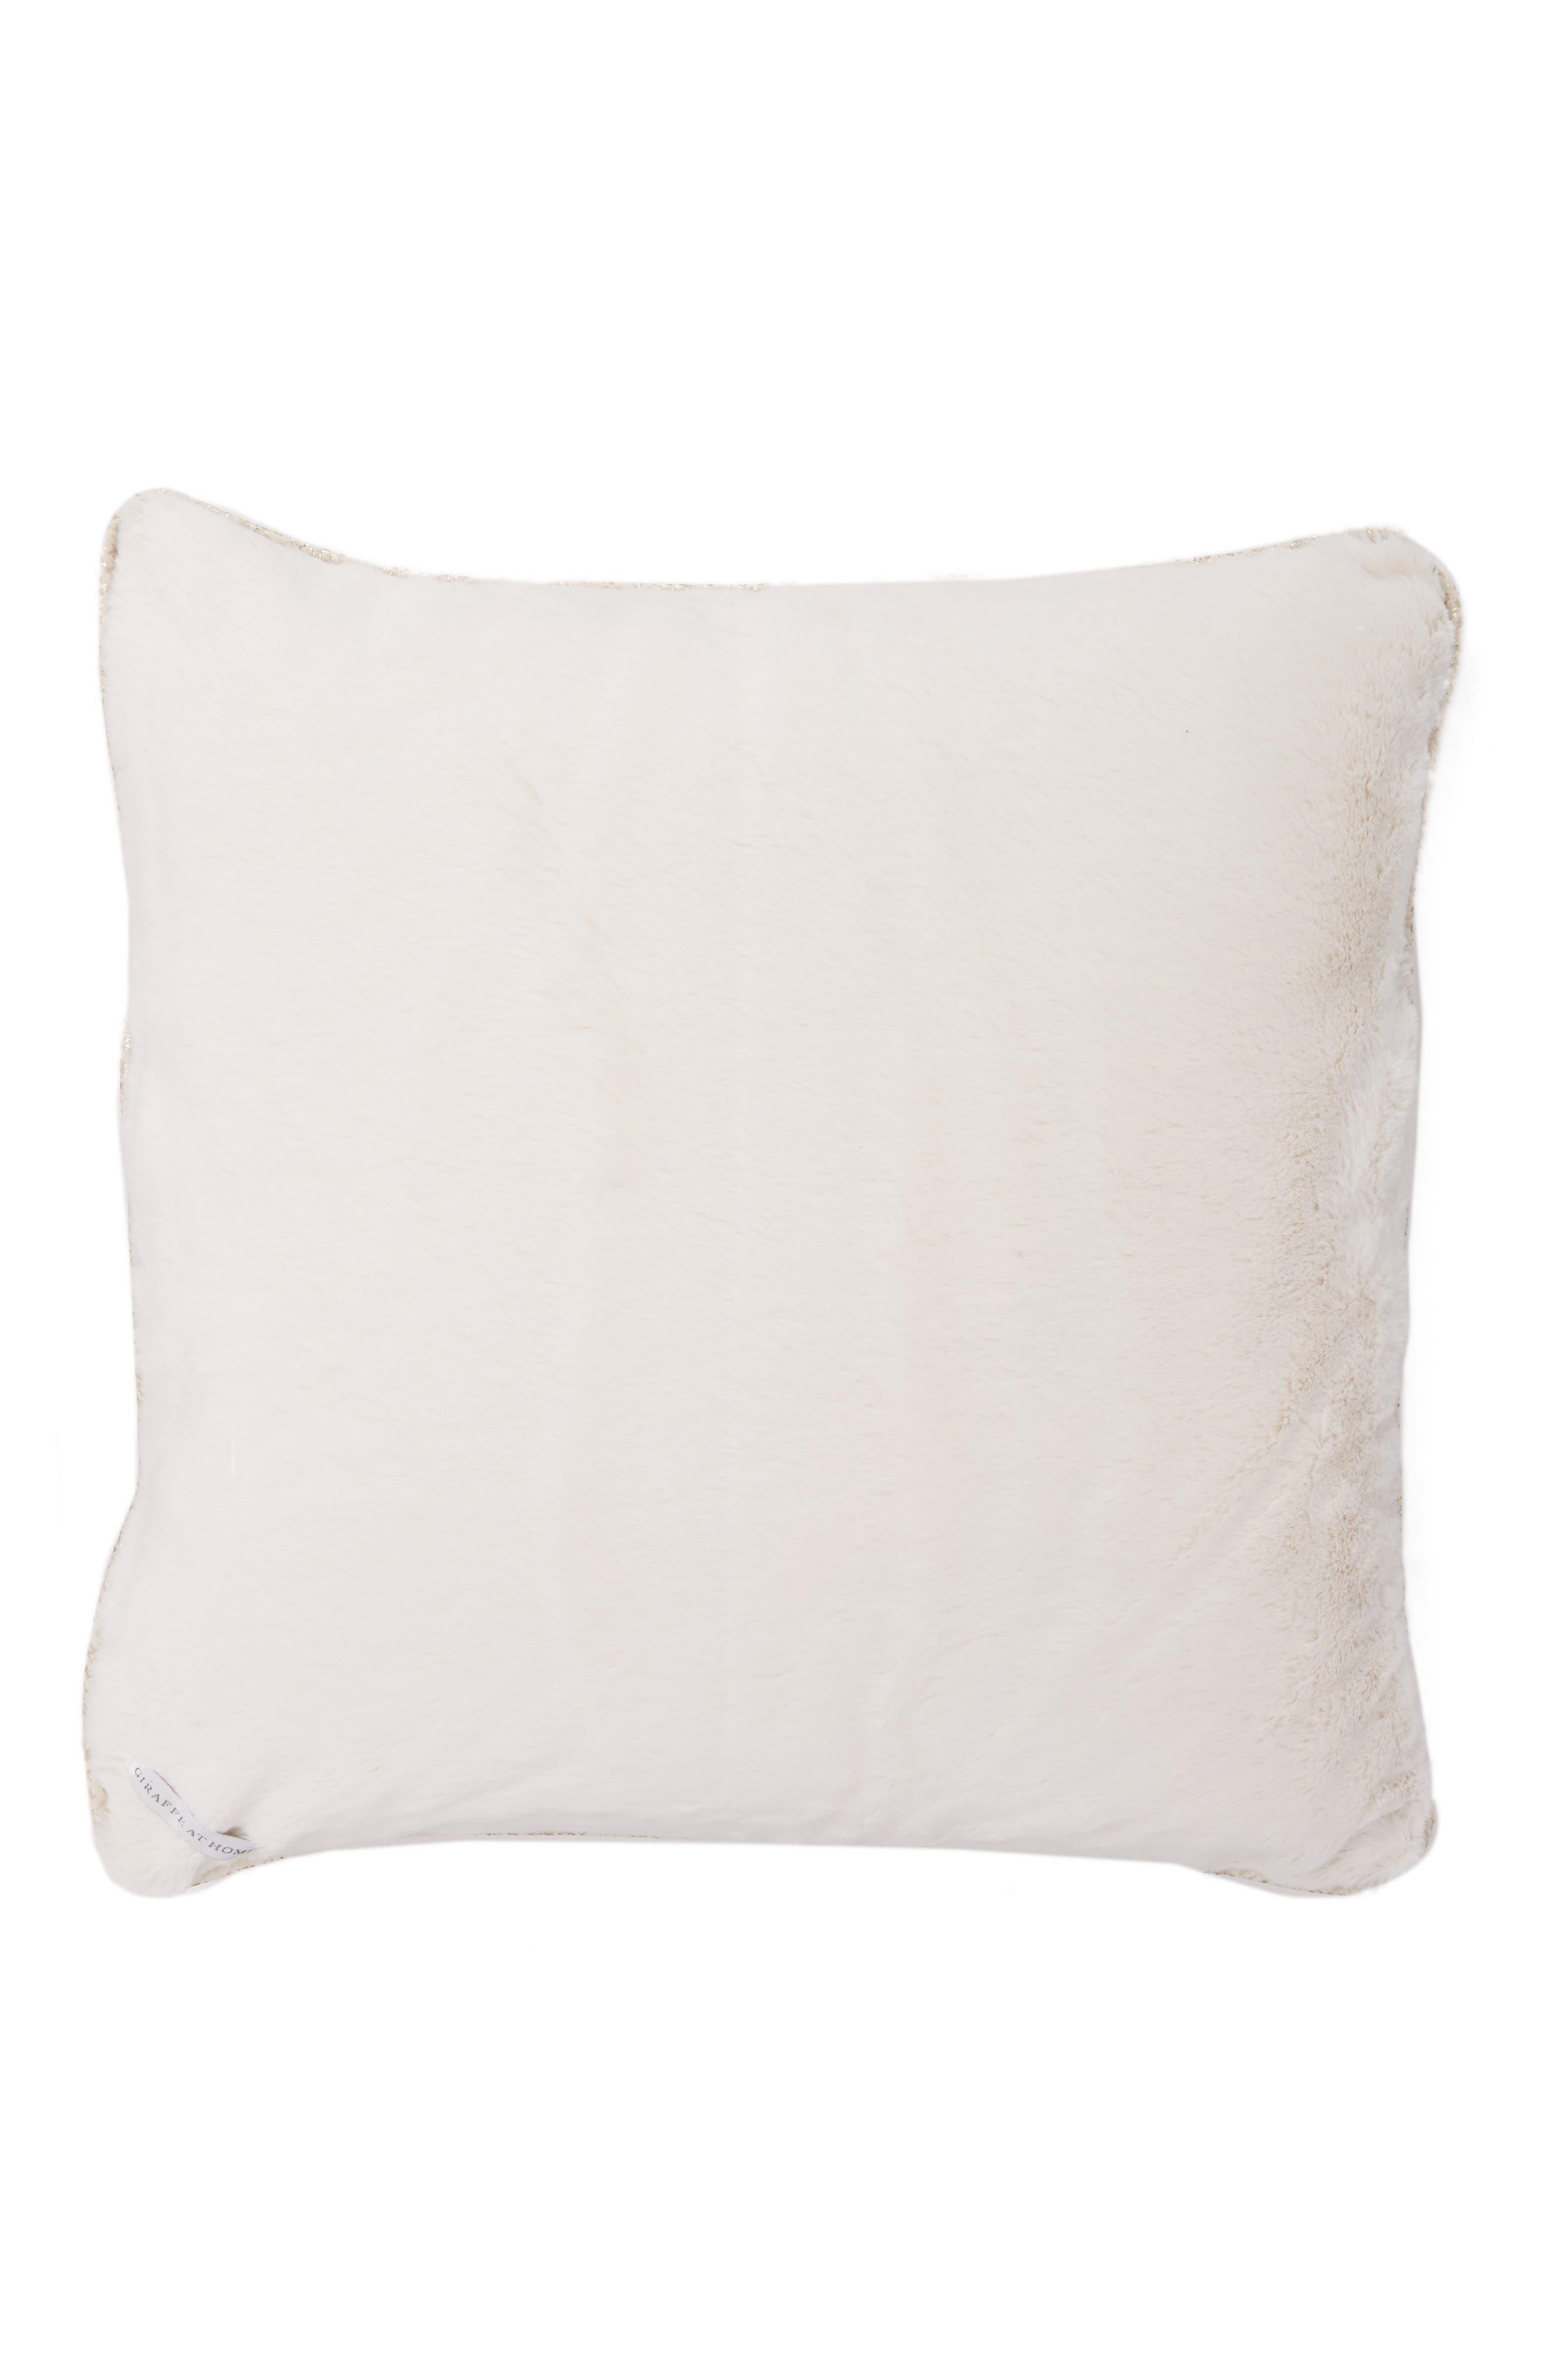 Main Image - Giraffe at Home Luxe™ Lustre Pillow